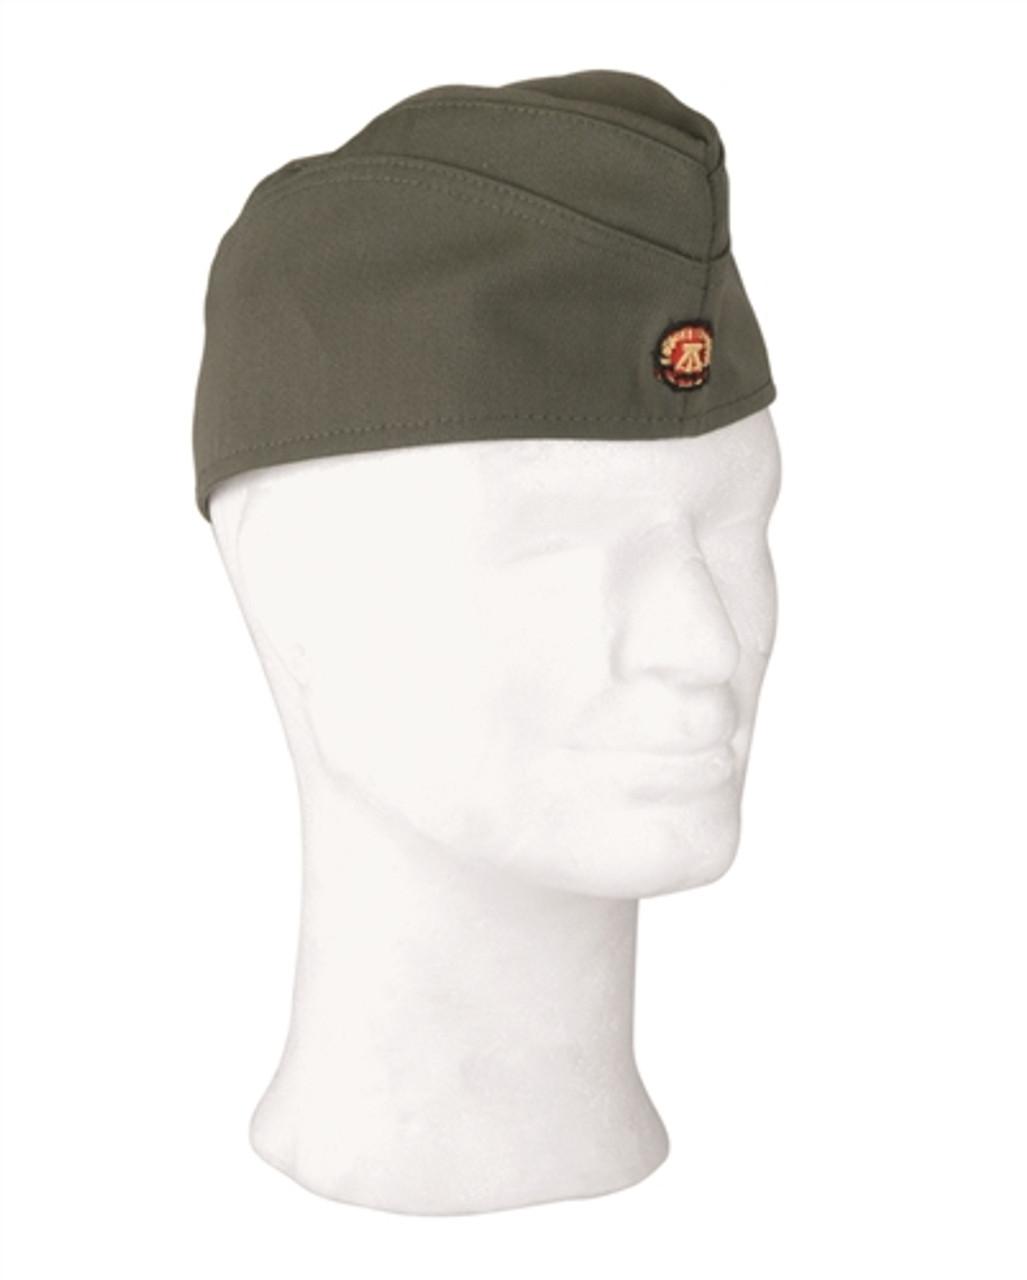 East German Army Officer's Overseas Hat - Like New from Hessen Surplus